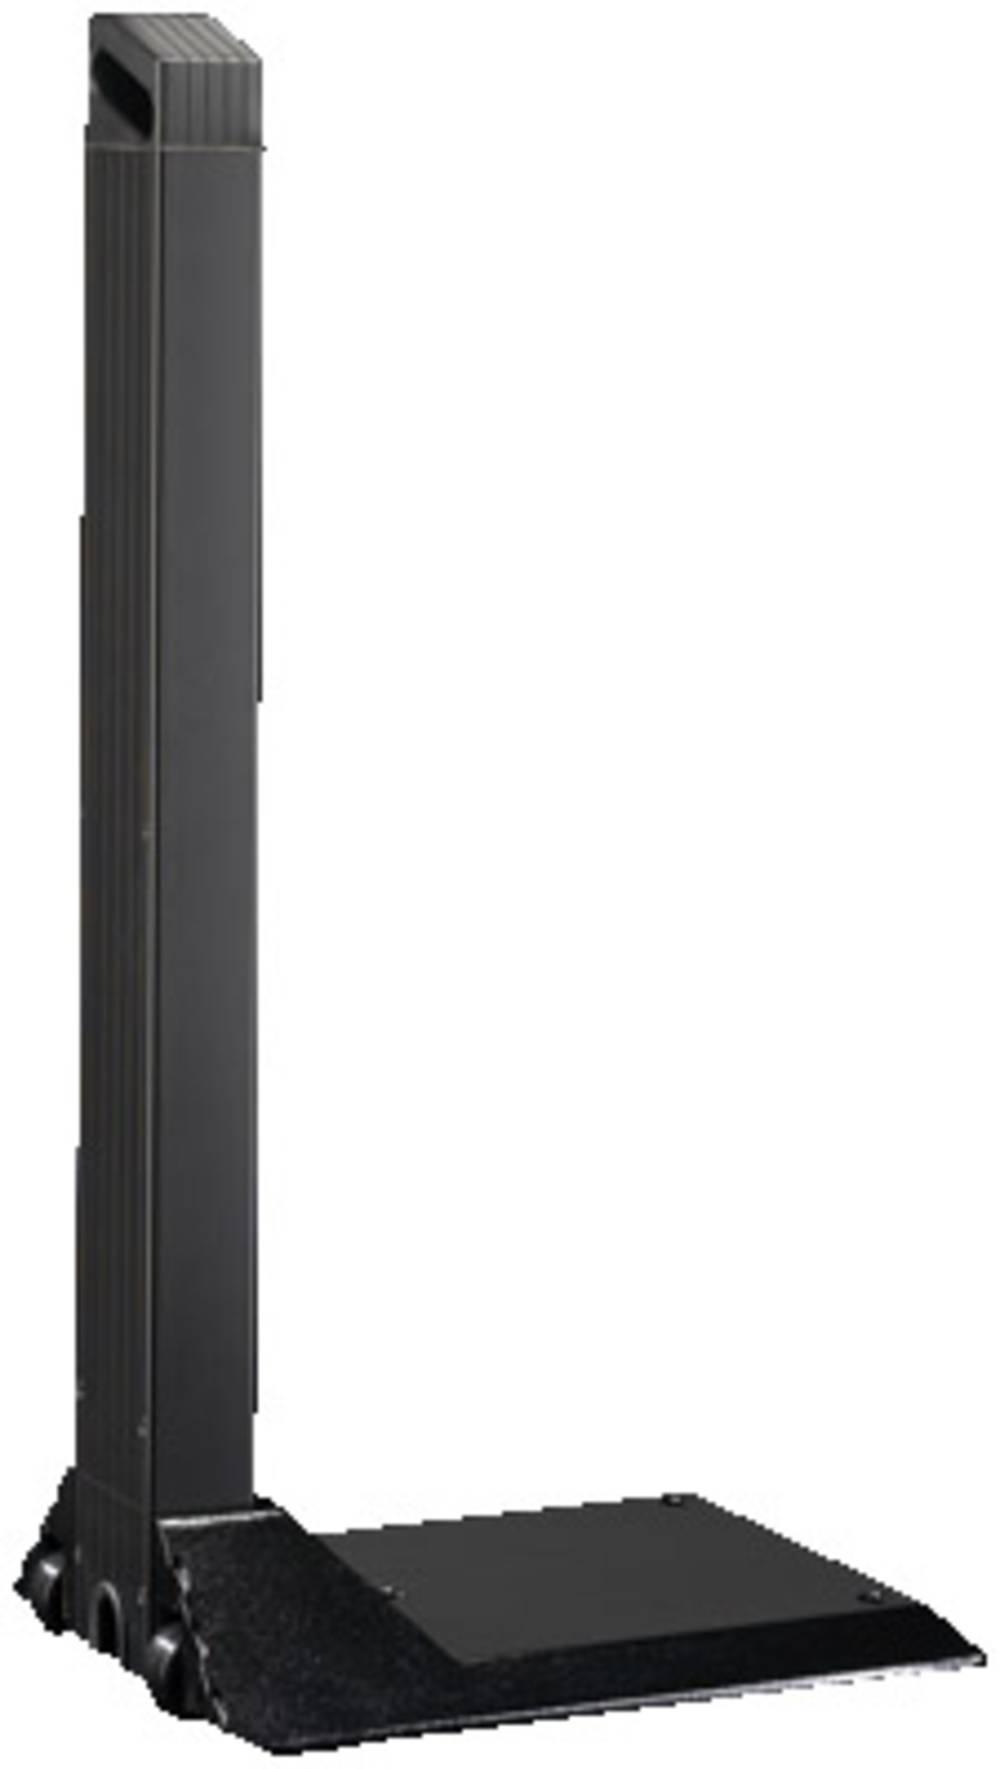 Fod Rittal CP 6135.000 (L x B x H) 500 x 360 x 995 mm Metal Grå (RAL 7035) 1 stk